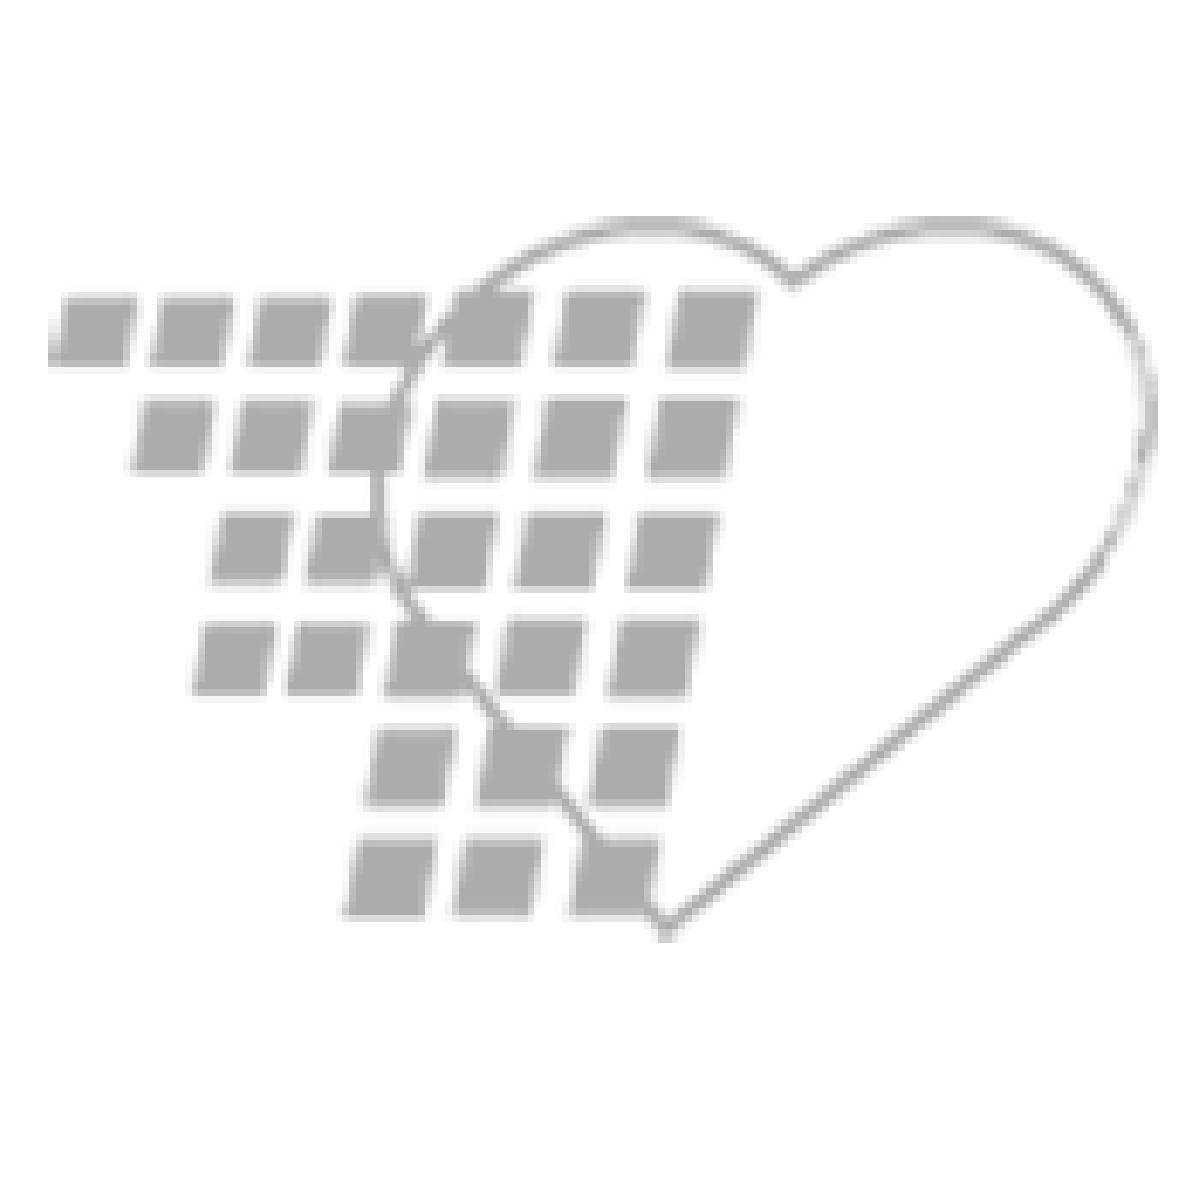 06-93-6002 - Demo Dose® Simulated Blood B Negative